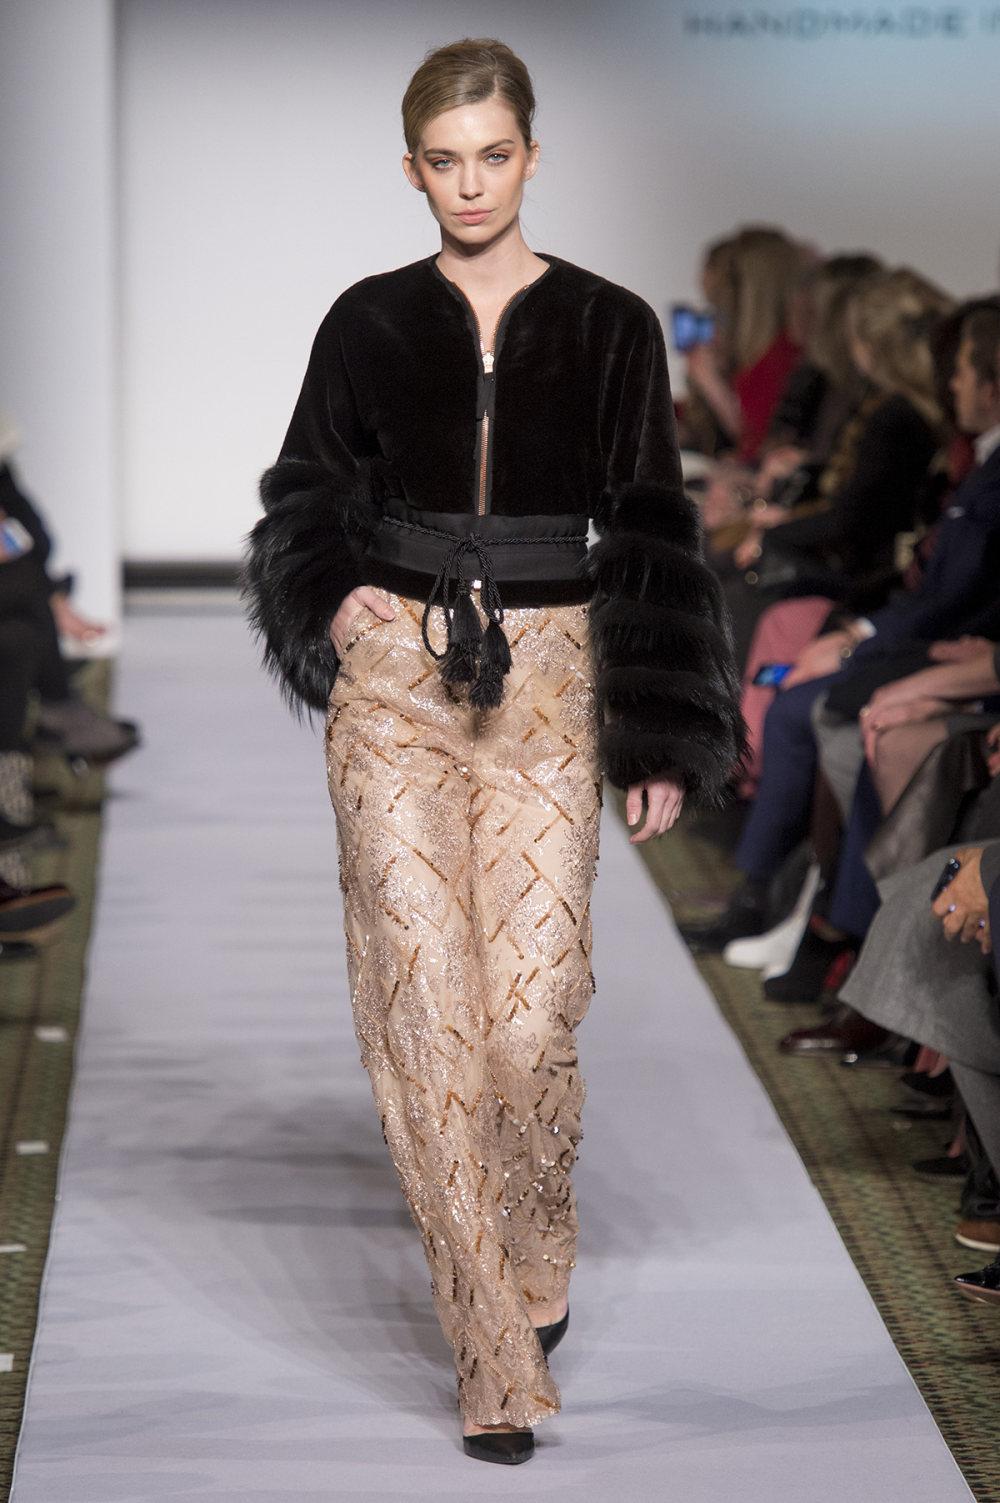 Carolina Herrera时装系列用鲜艳的颜色充满智能的黑白色调-43.jpg